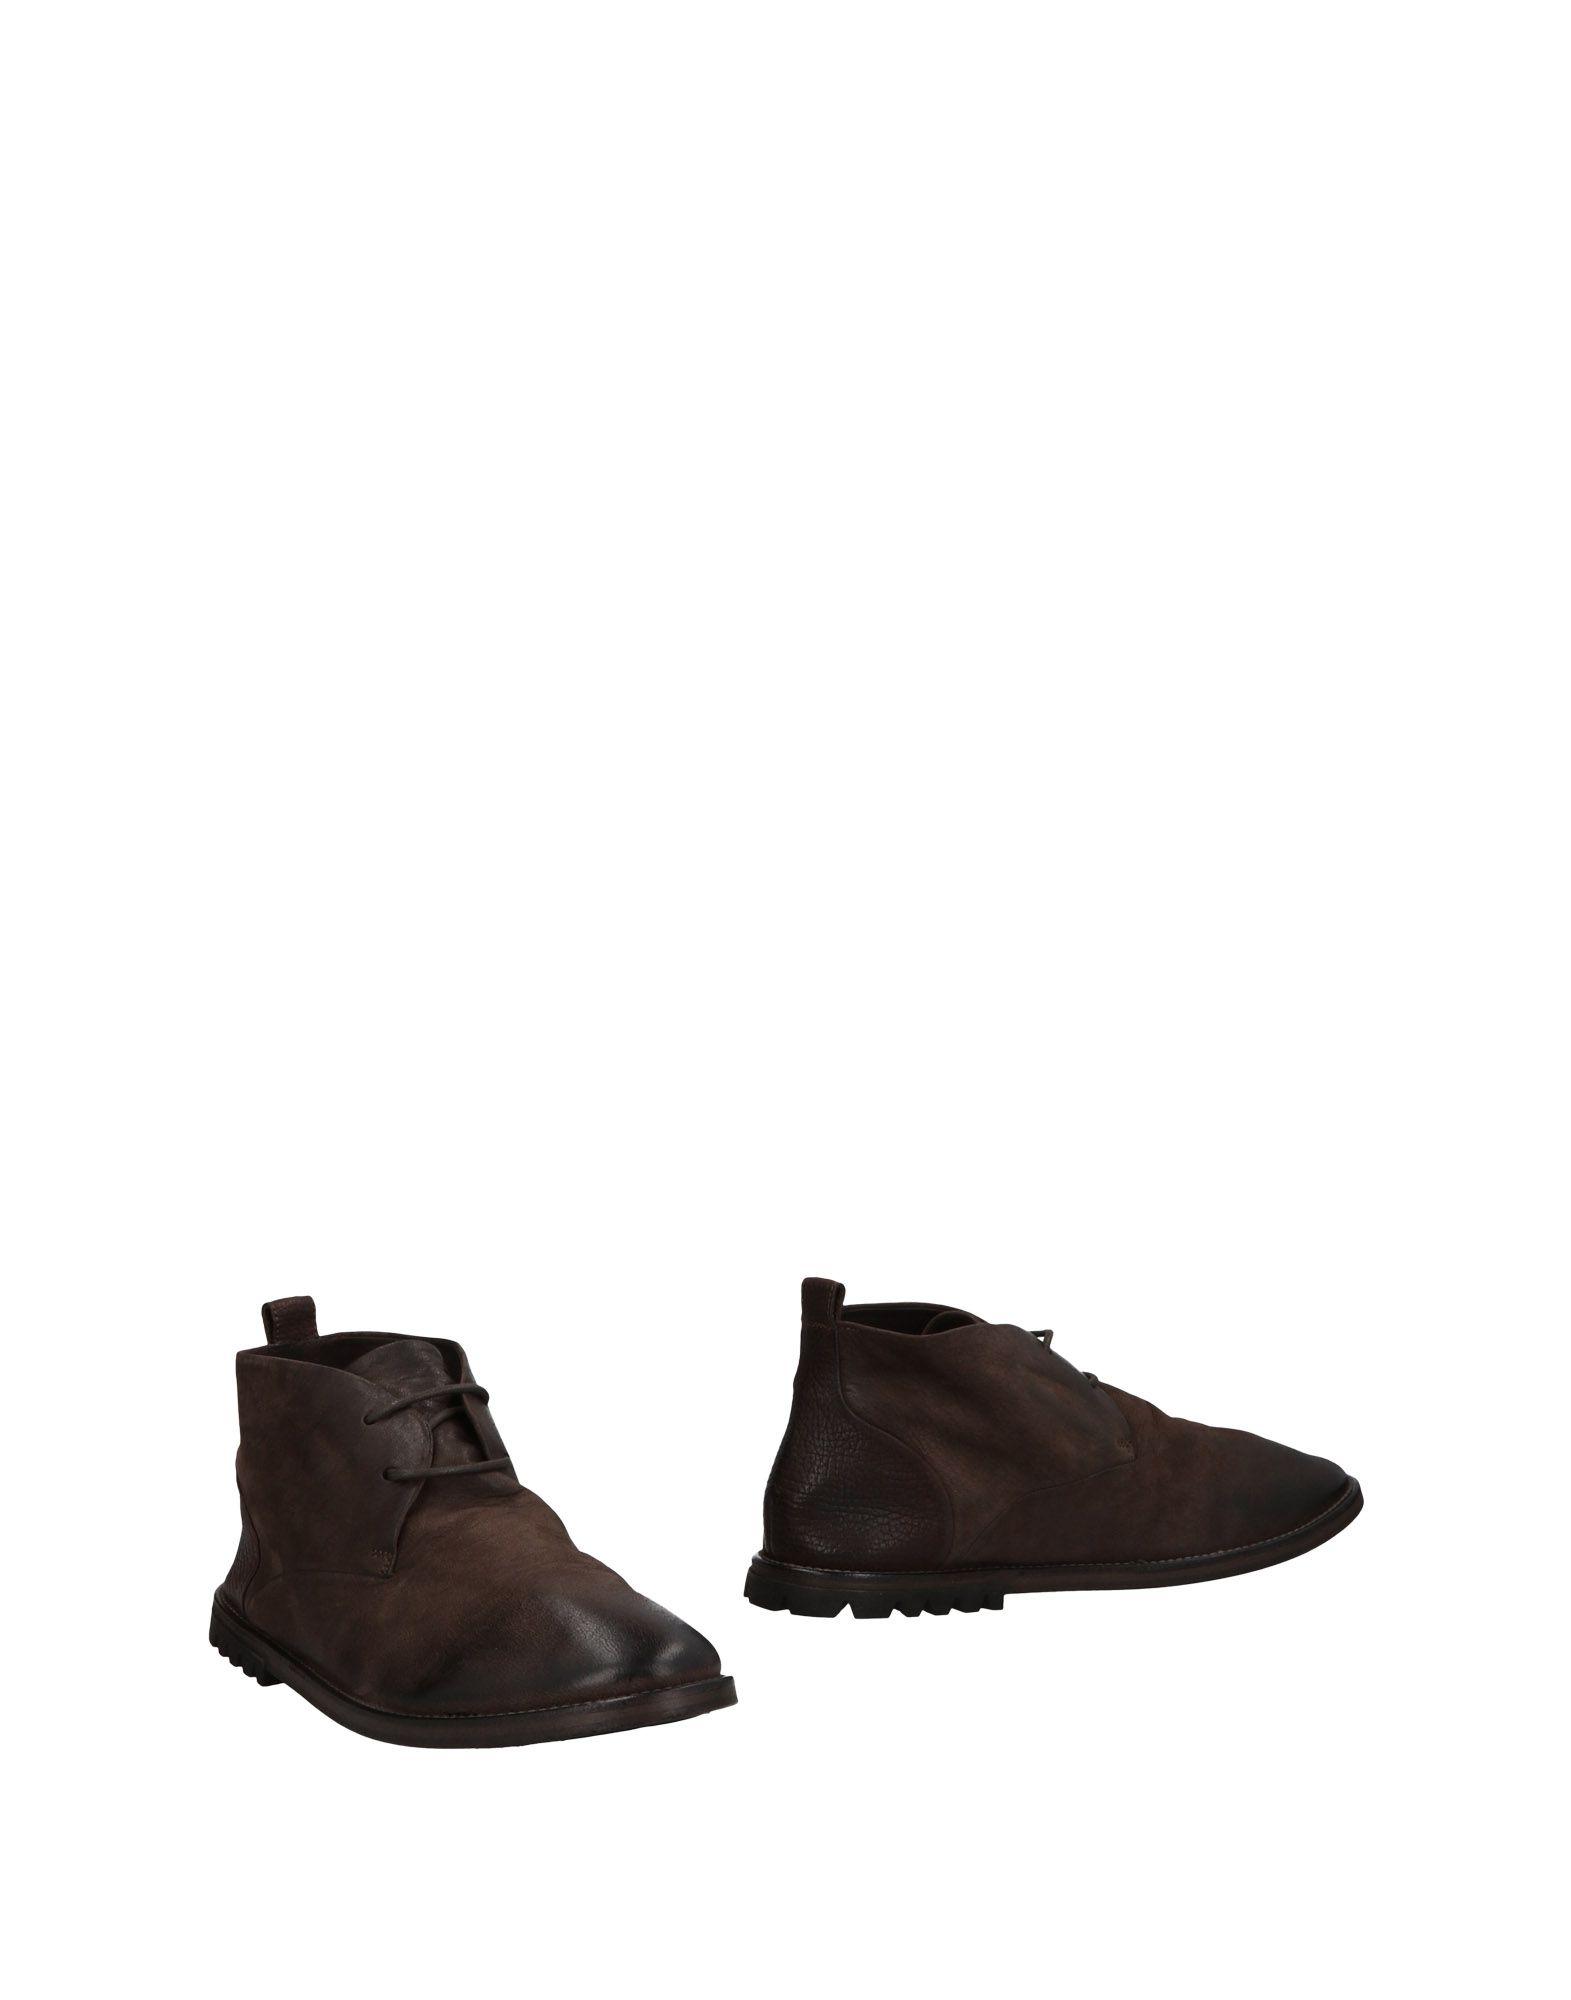 Marsèll Stiefelette Herren  11476170IA Schuhe Gute Qualität beliebte Schuhe 11476170IA aaacda